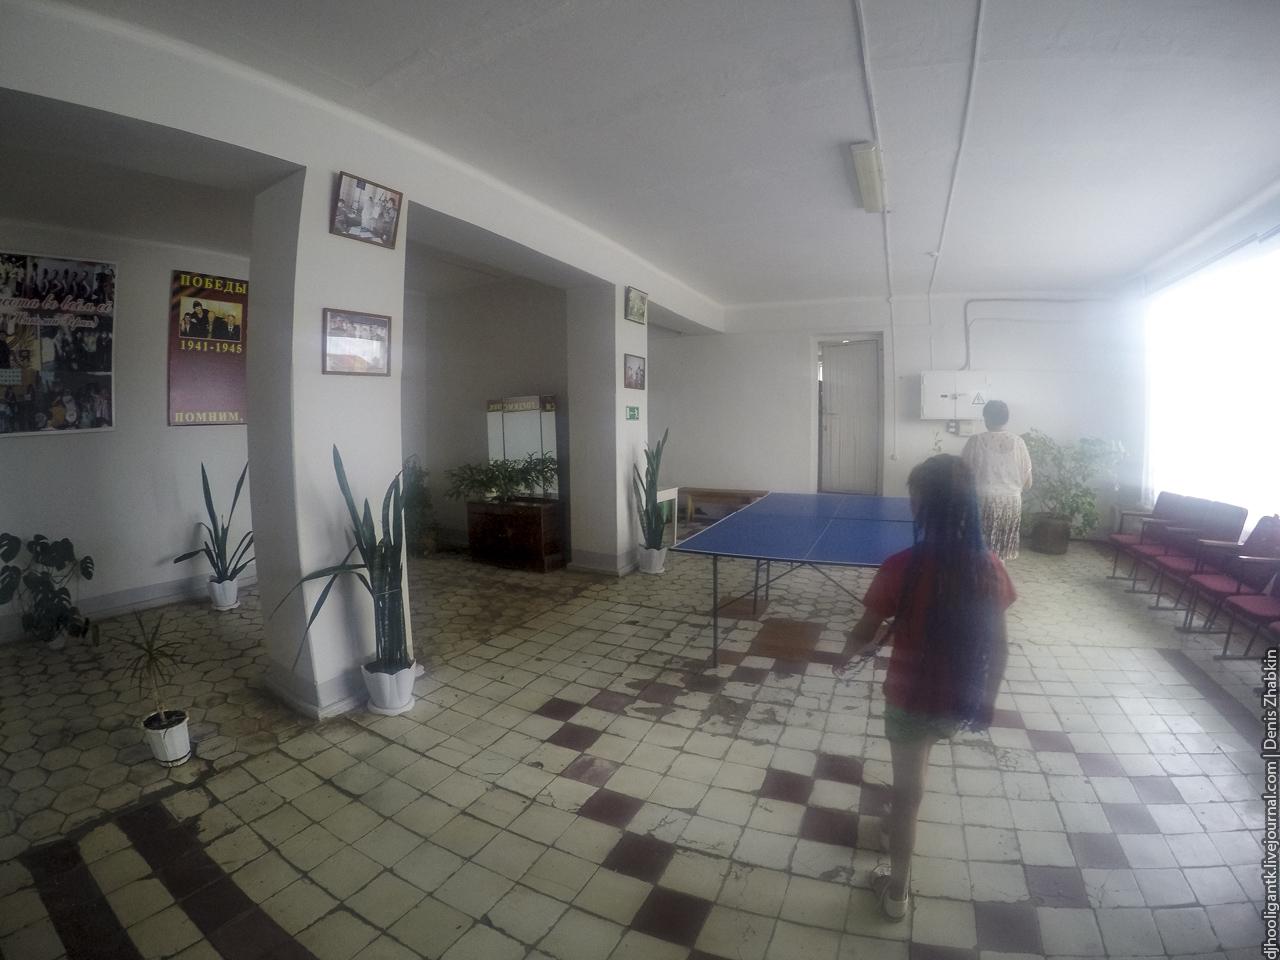 GOPR0461_1.jpg